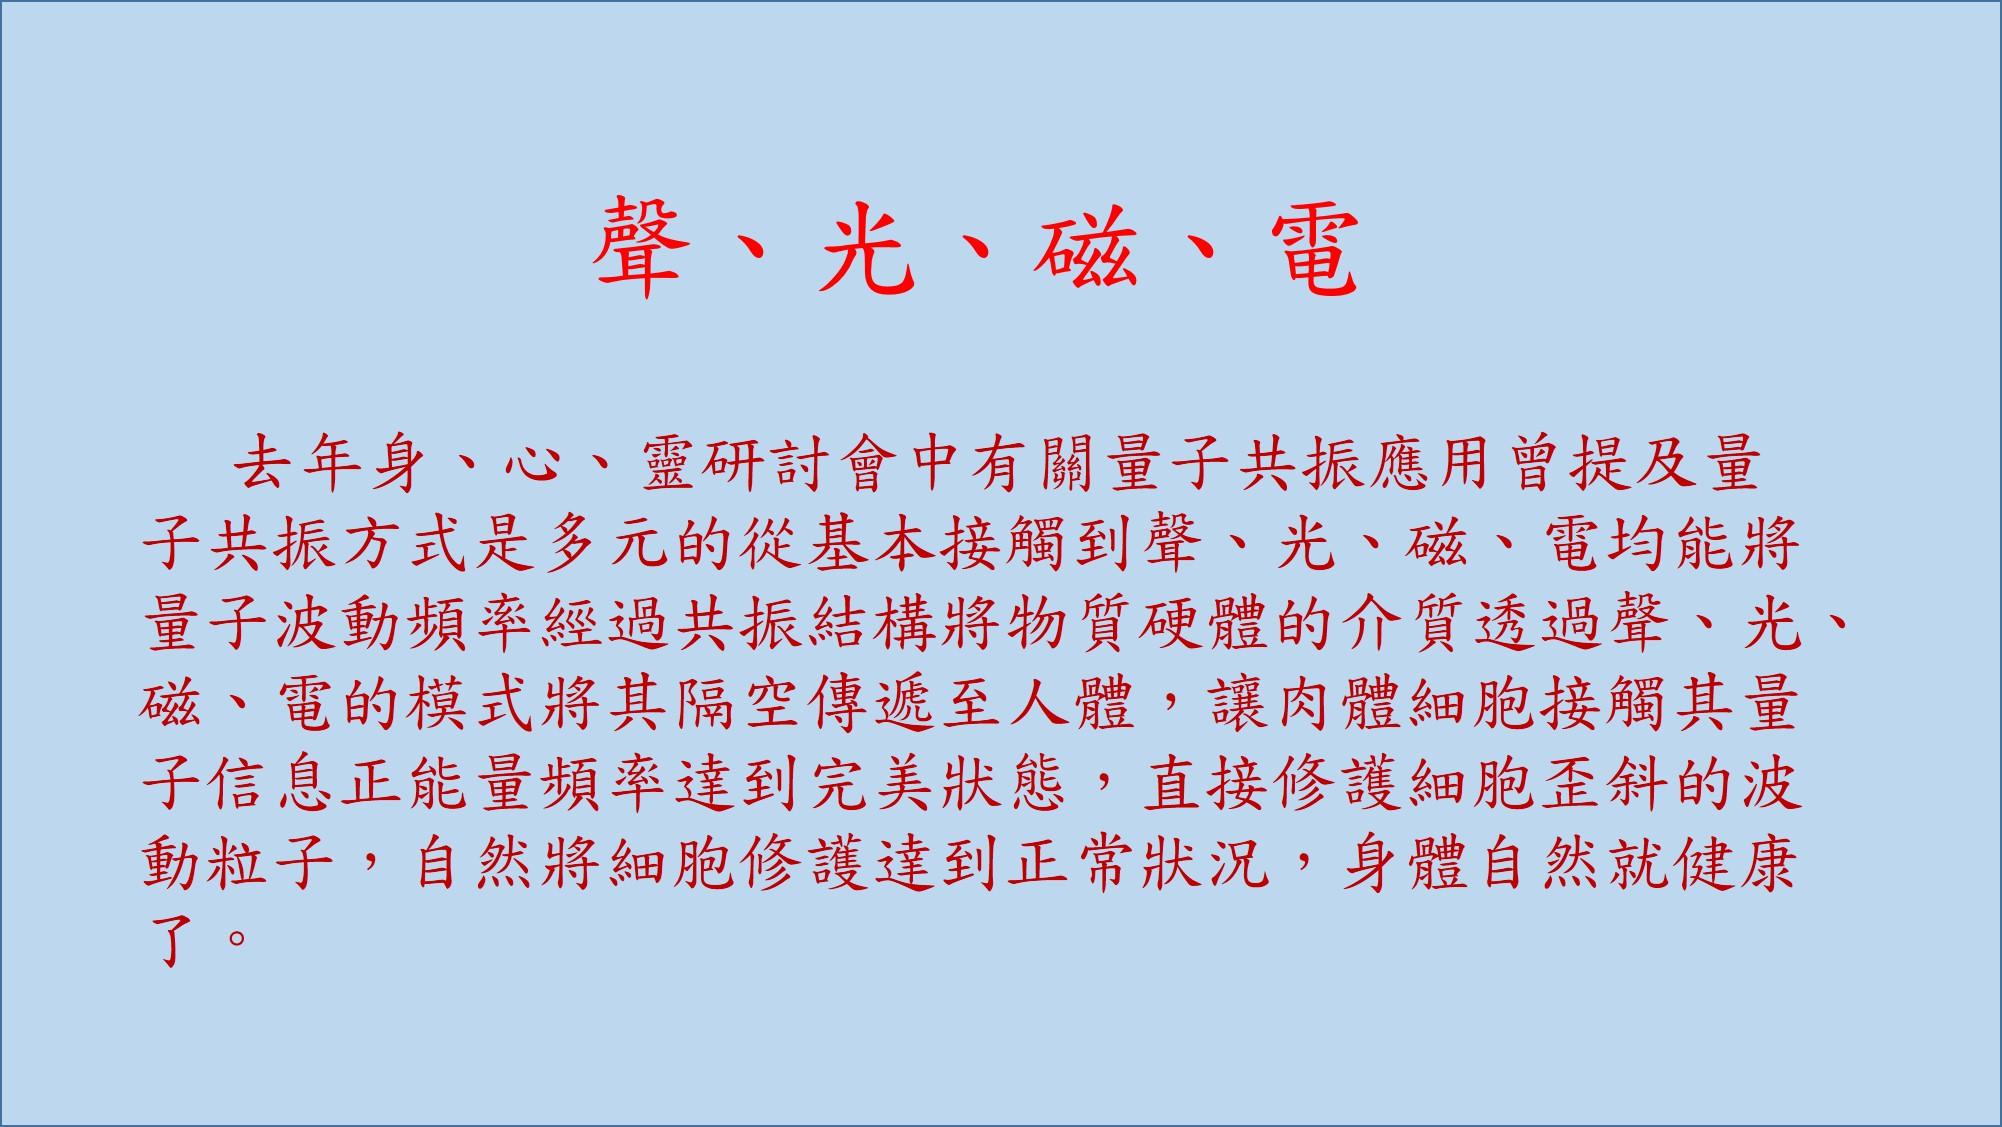 http://taiwancom.tw/biochip/biowell-3.jpg